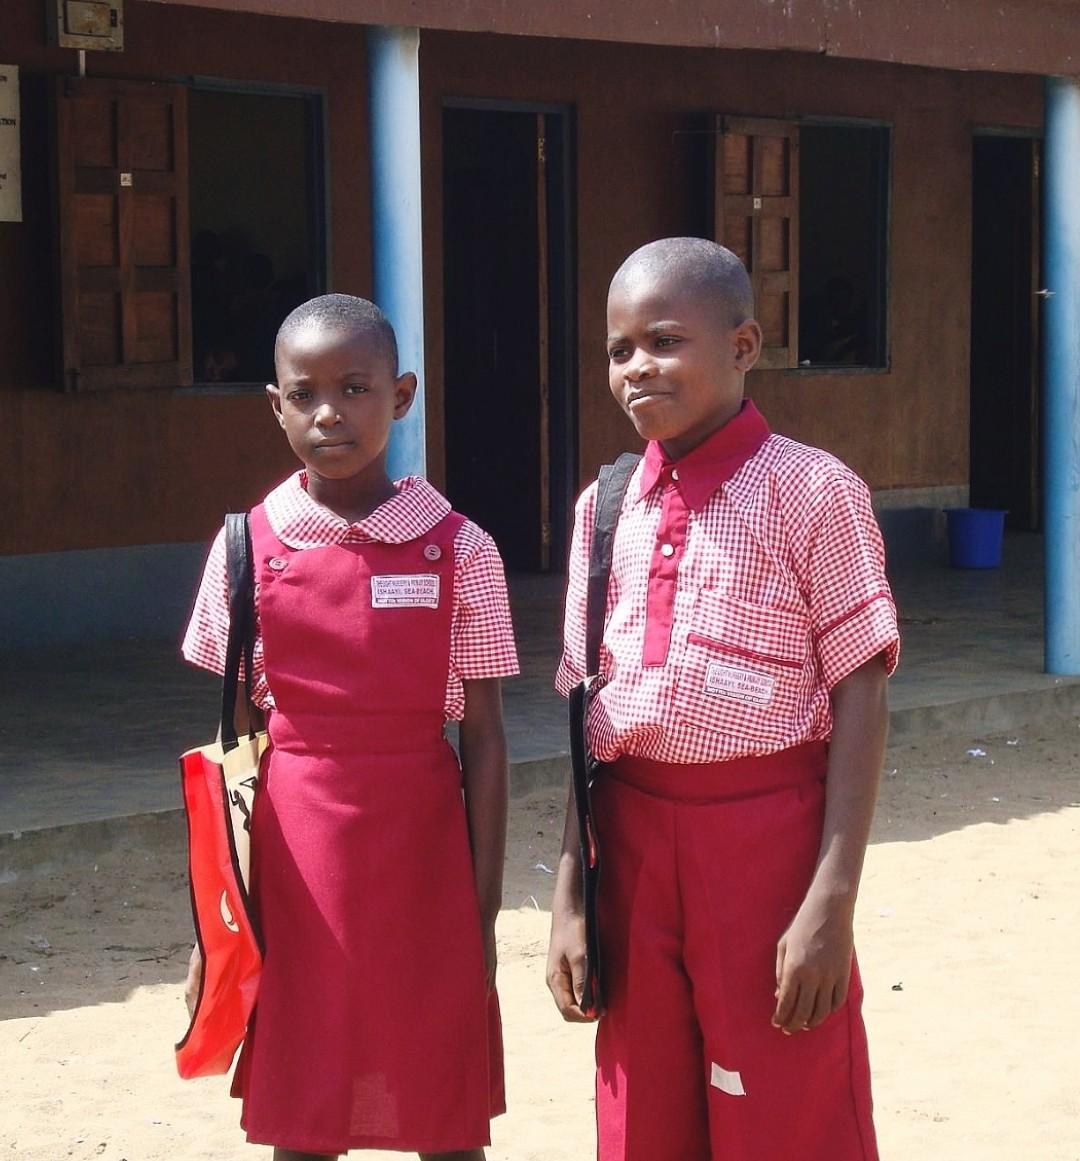 Two children model their new school uniforms.